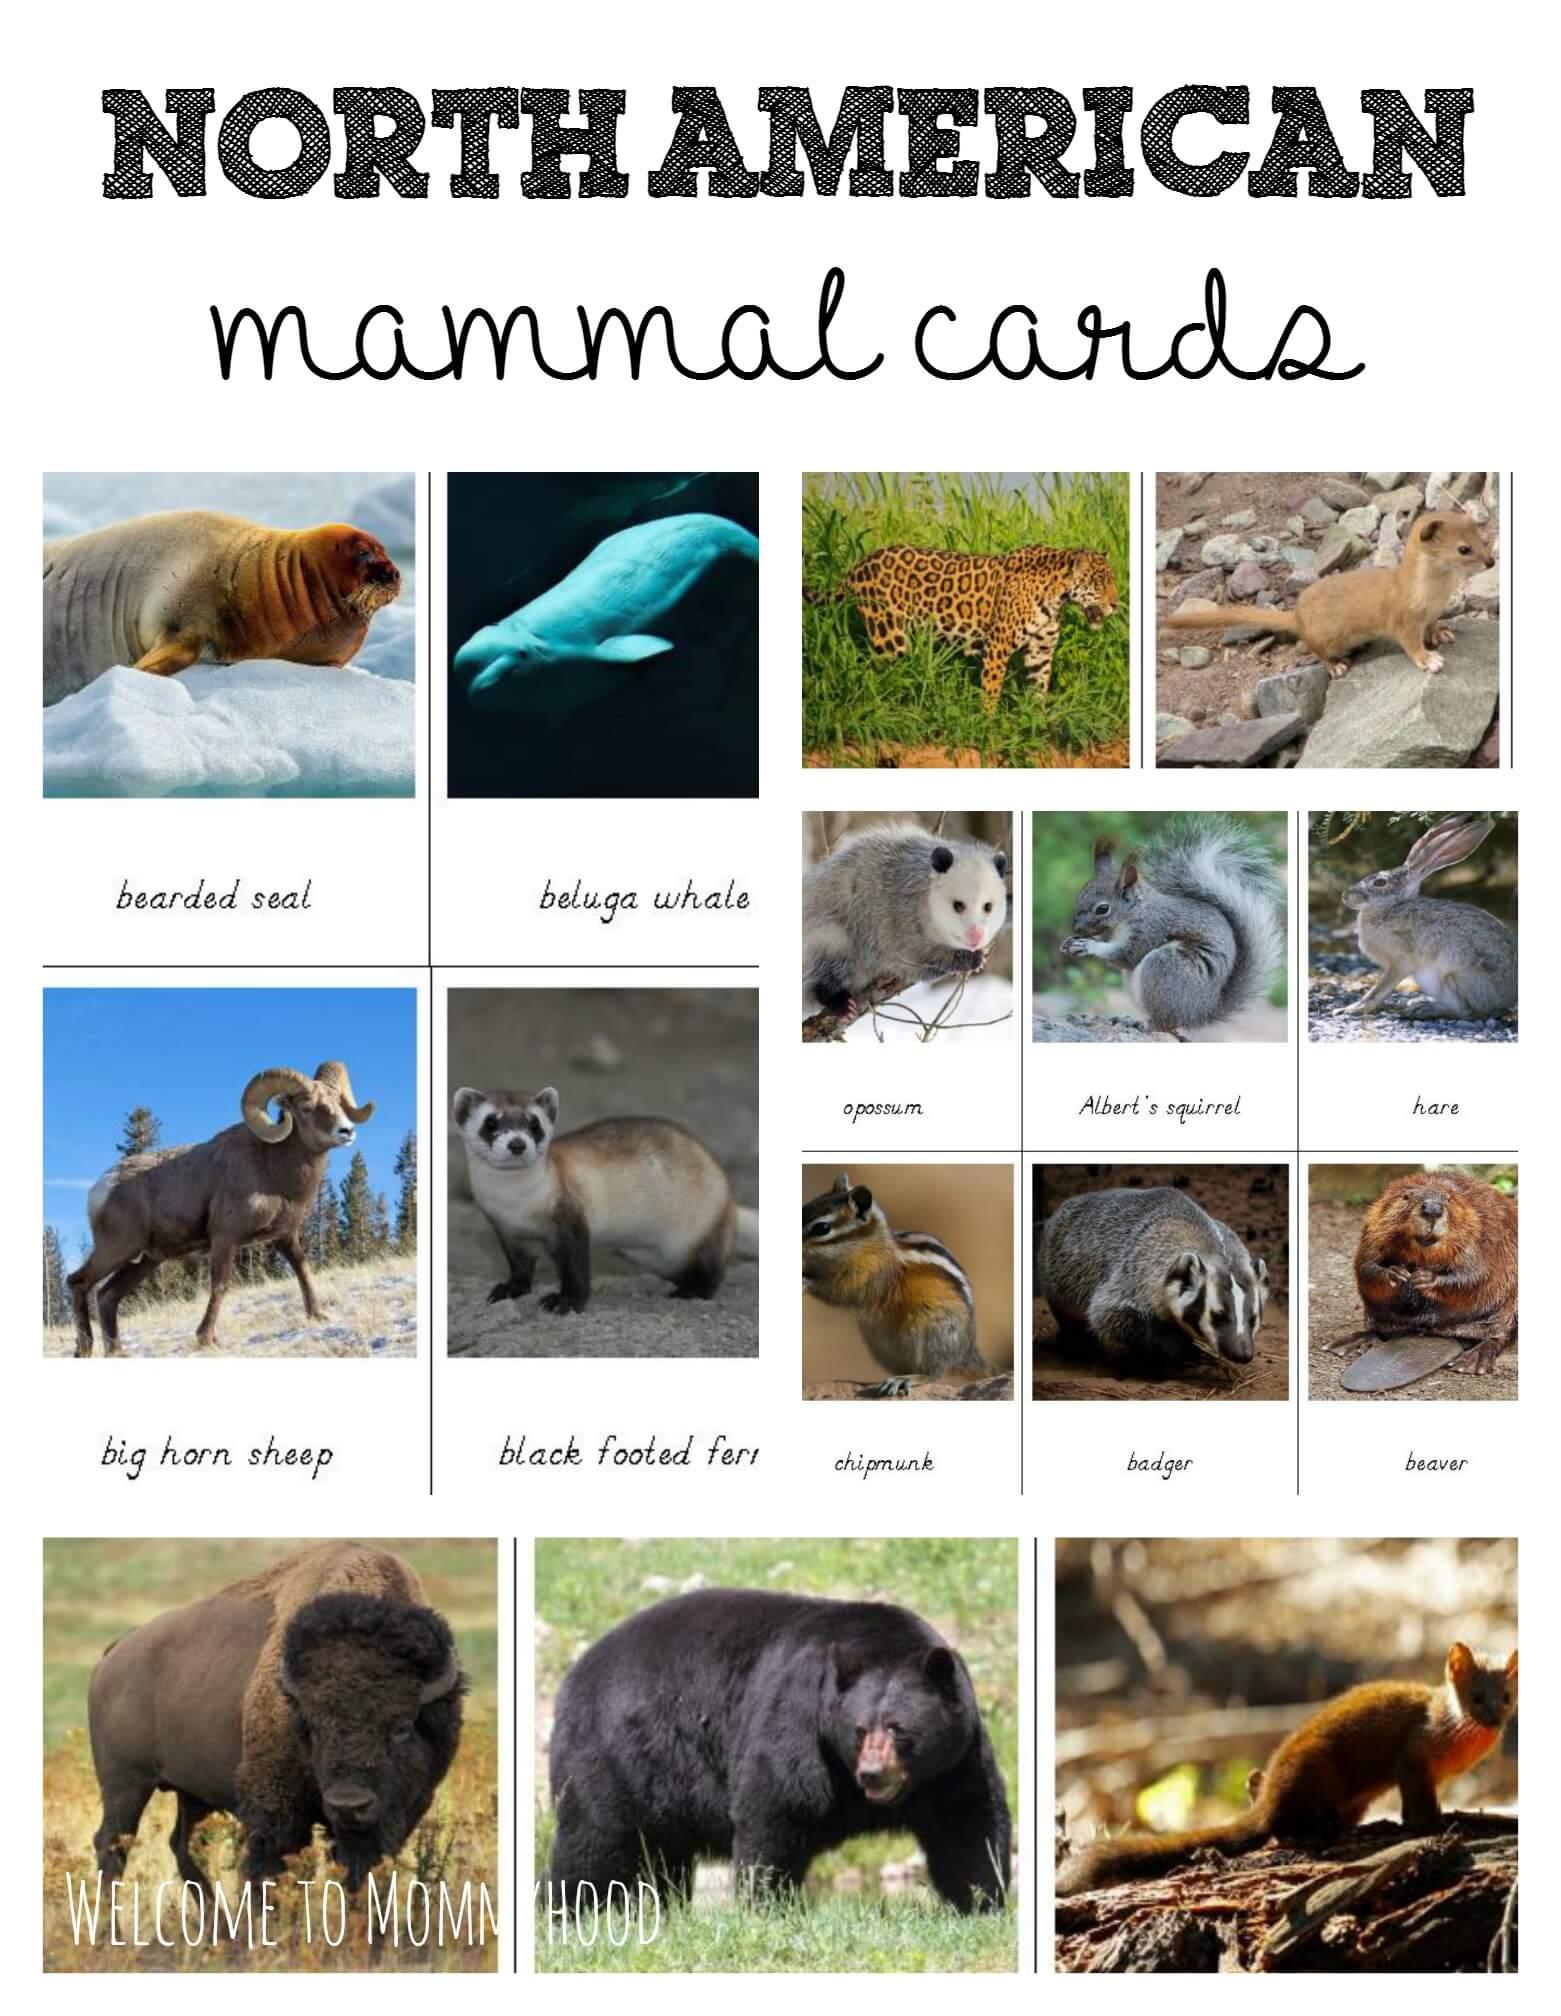 North American Mammals Cards For Montessori Activities